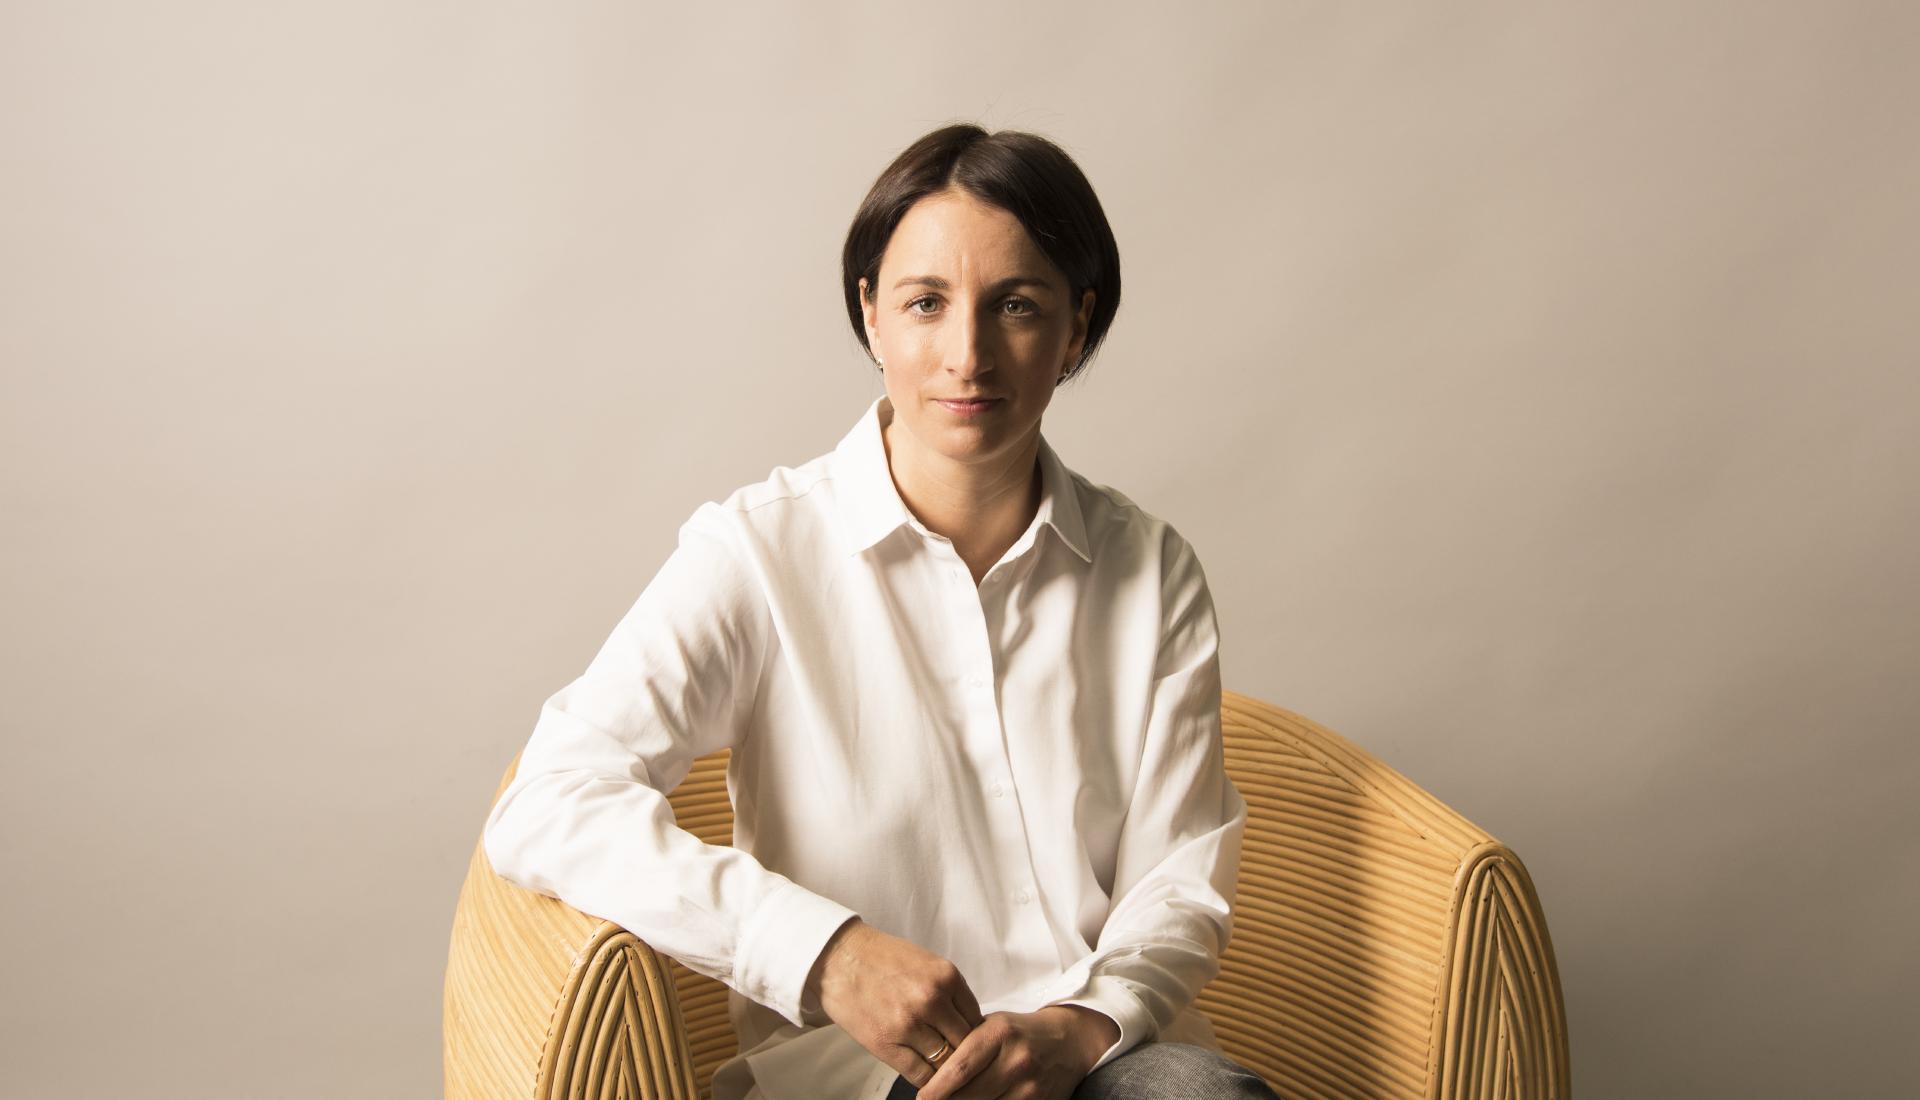 Sabine Höfer